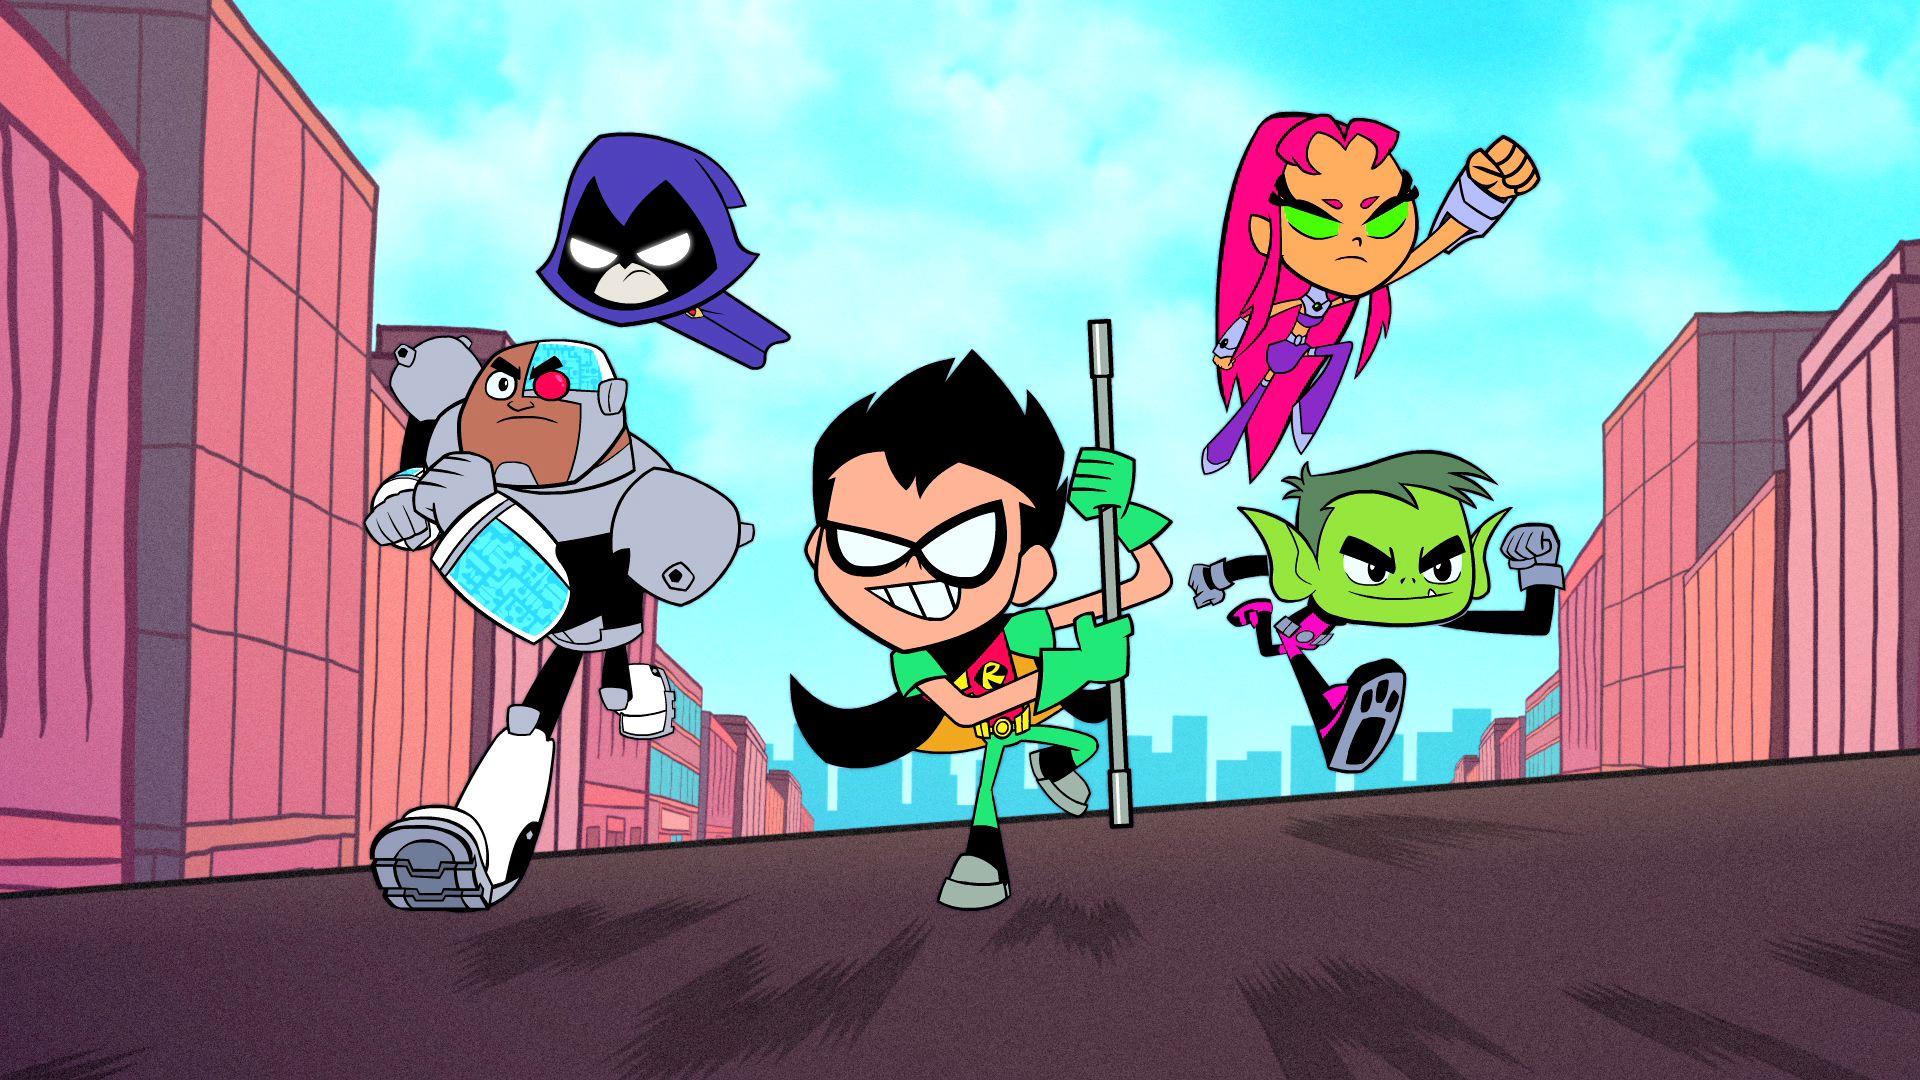 Teen Titans Go Season 2 Released On Dvd - Geekdad-2480